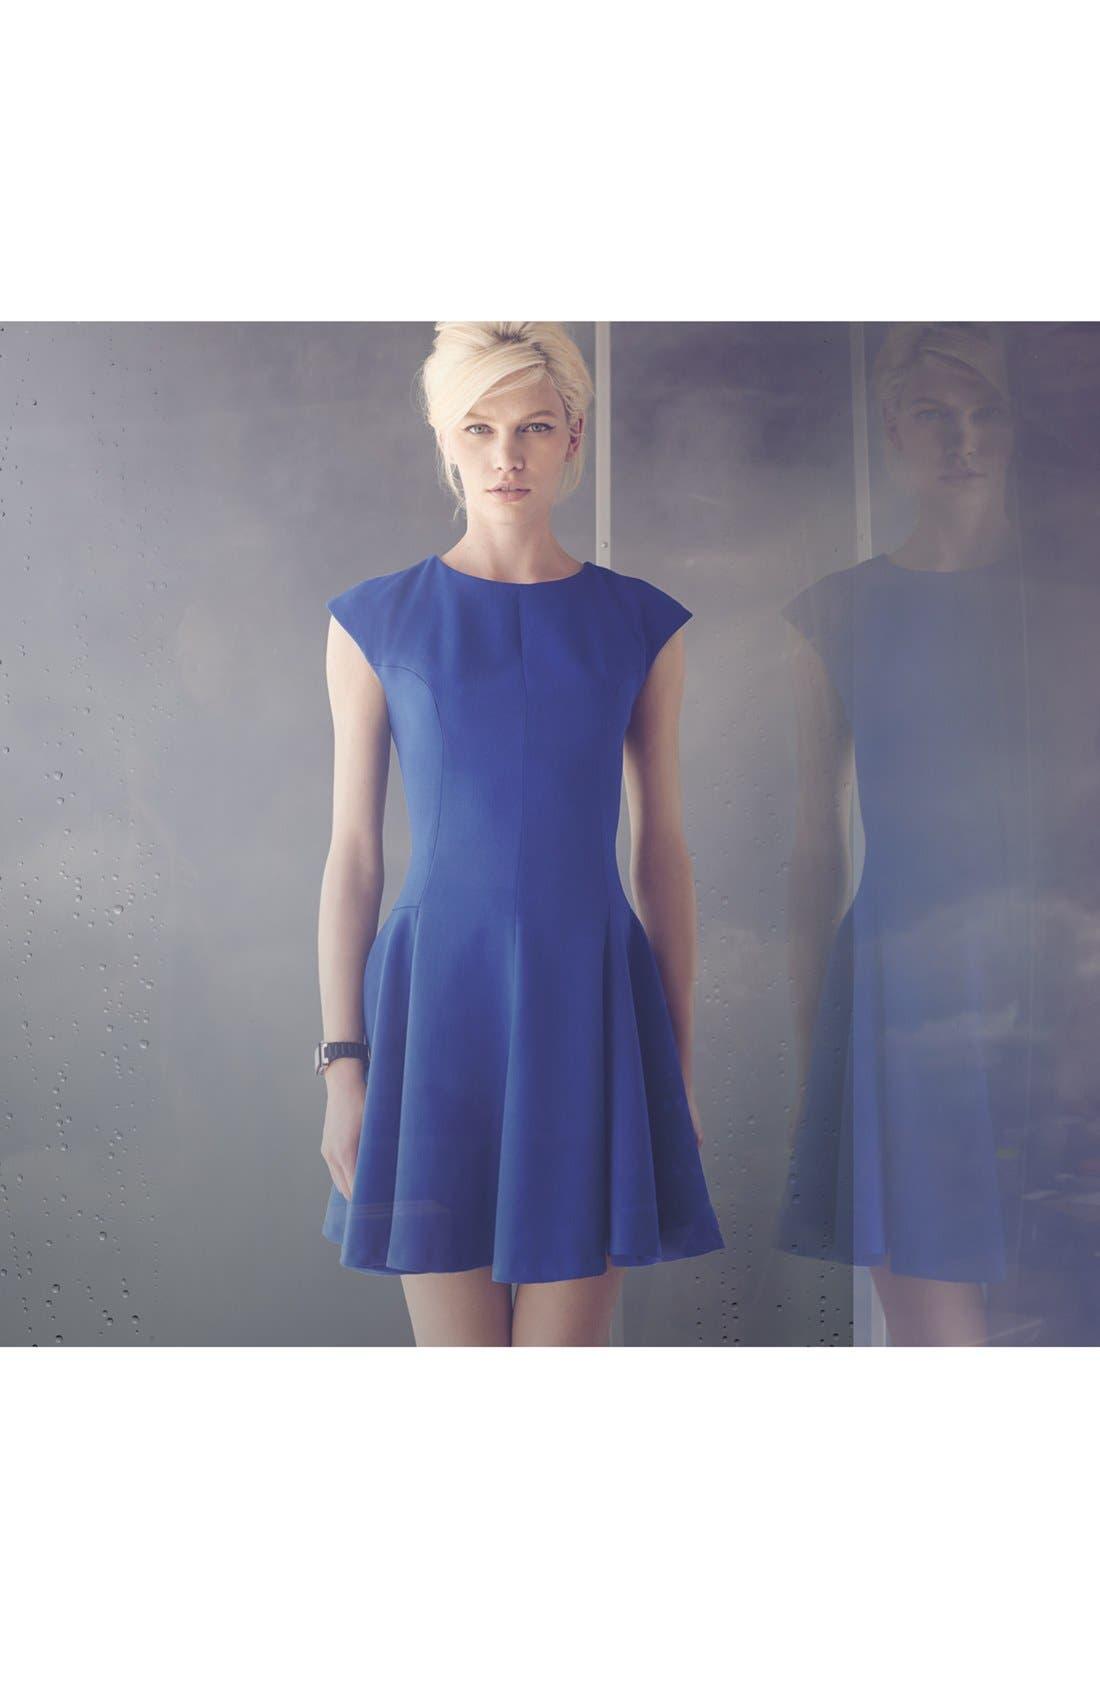 Main Image - Eliza J Skater Dress & Accessories